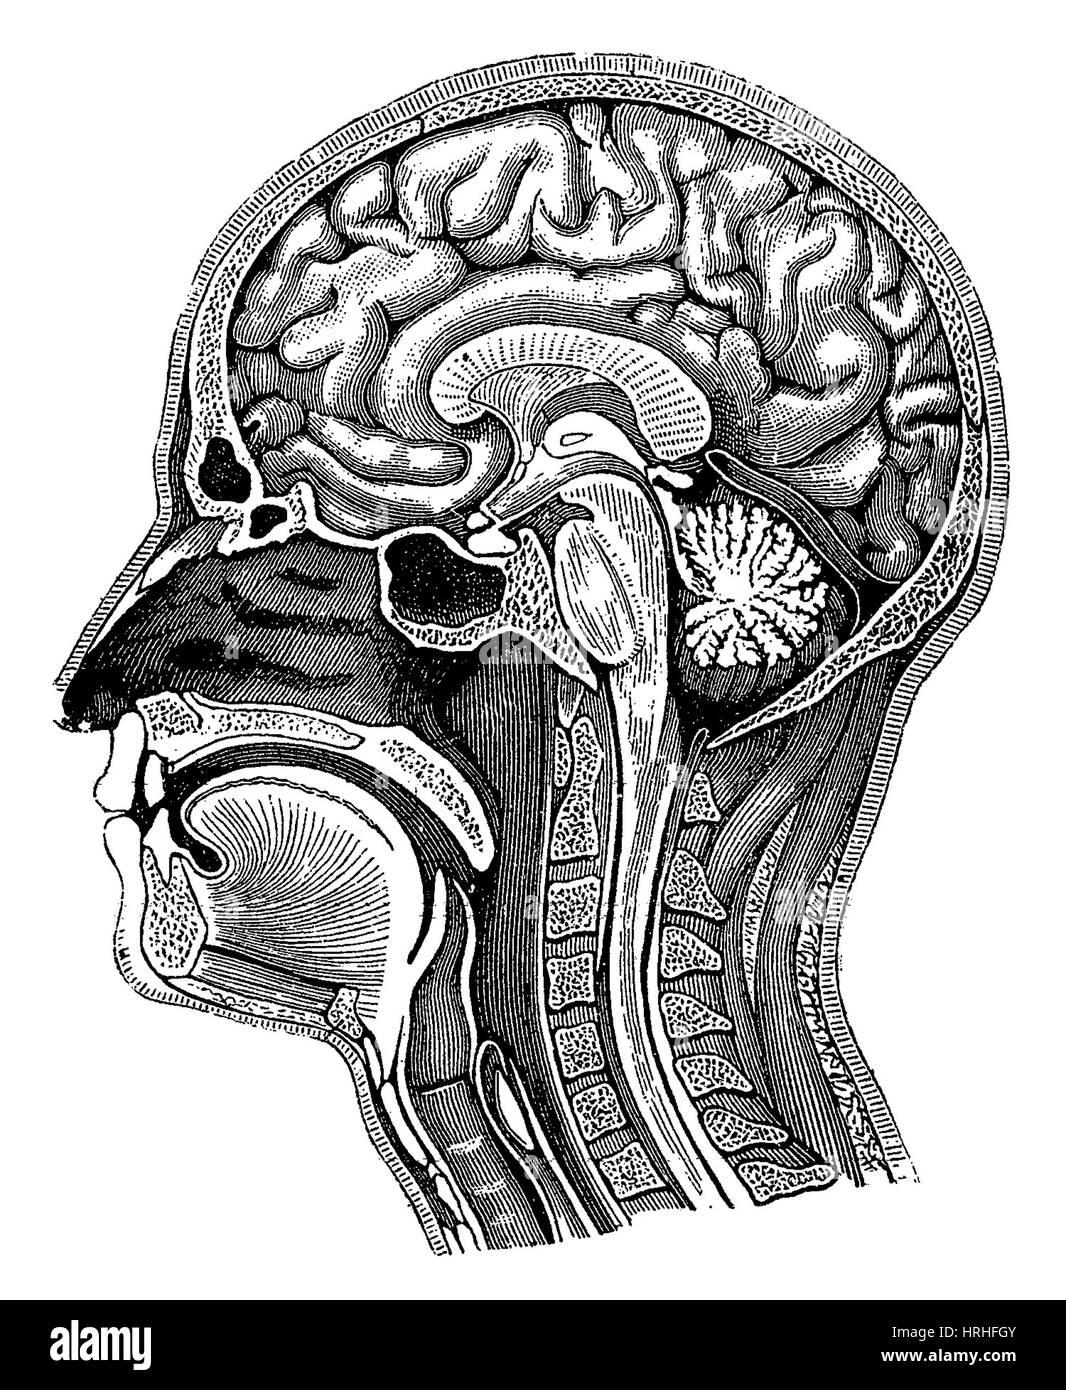 Kopf und Gehirn-Anatomie Stockfoto, Bild: 134995083 - Alamy